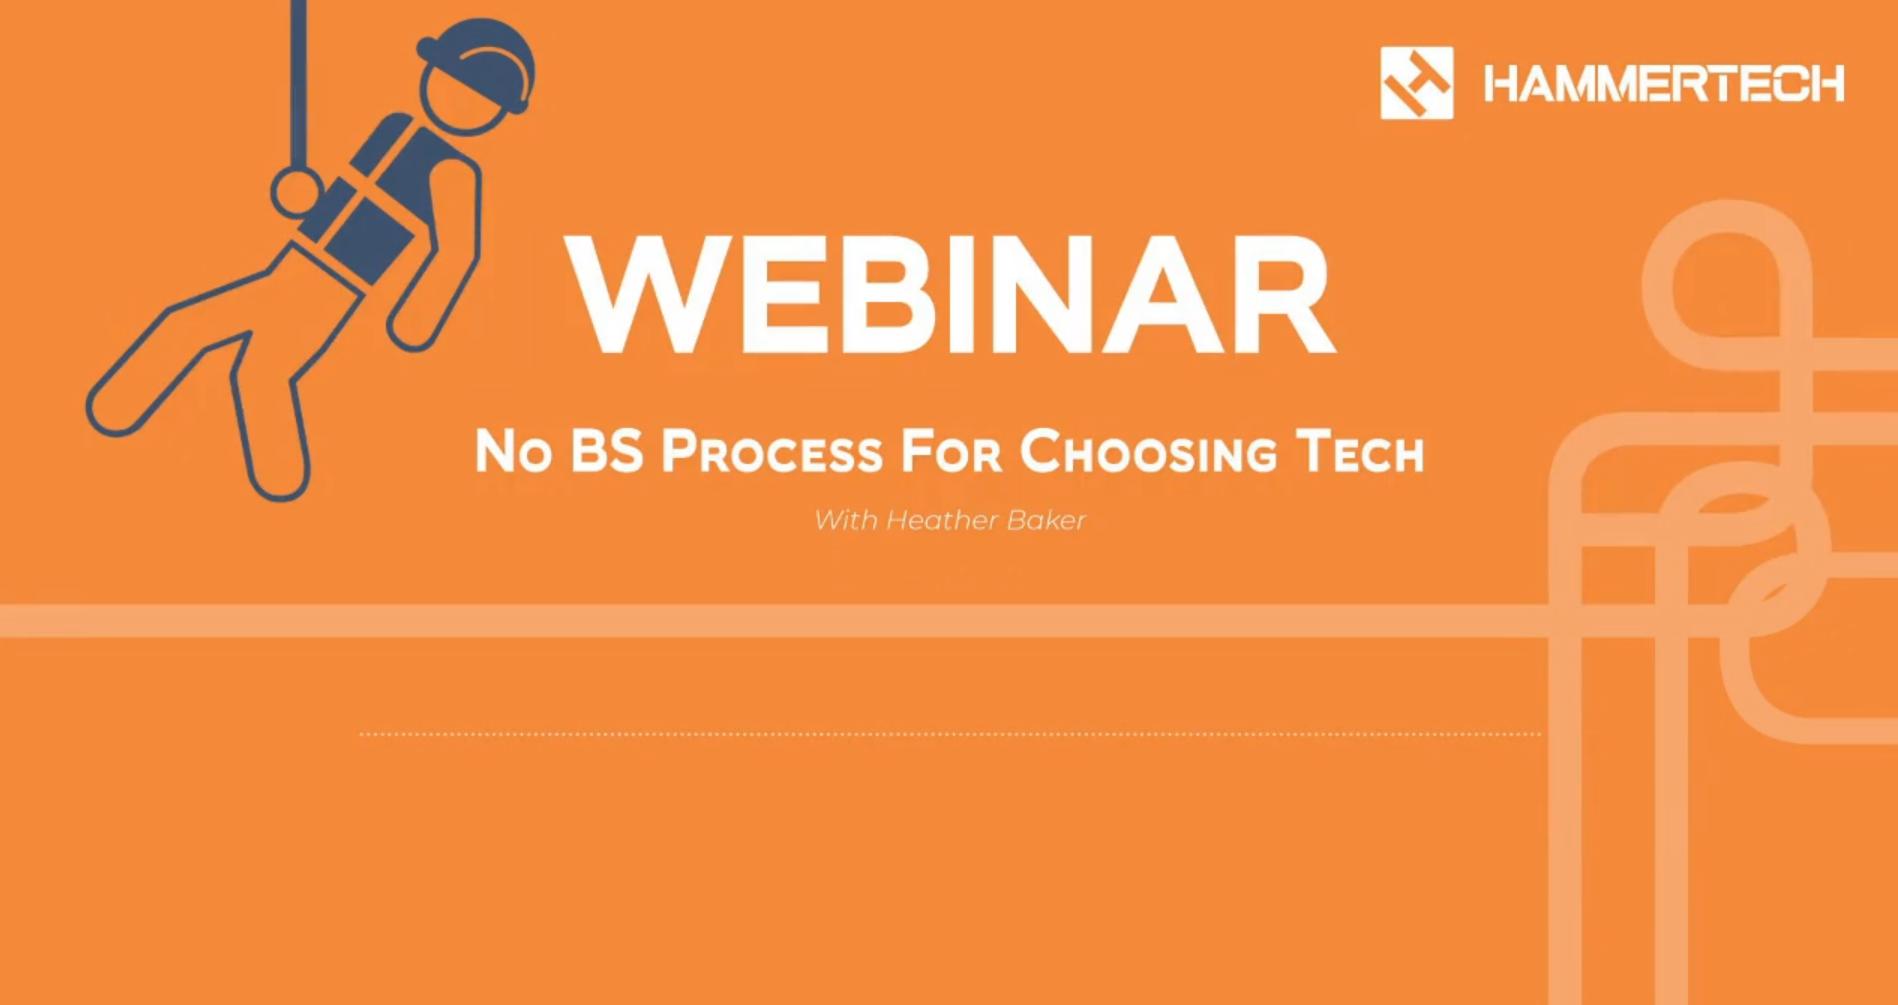 NO BS Process for Choosing tech